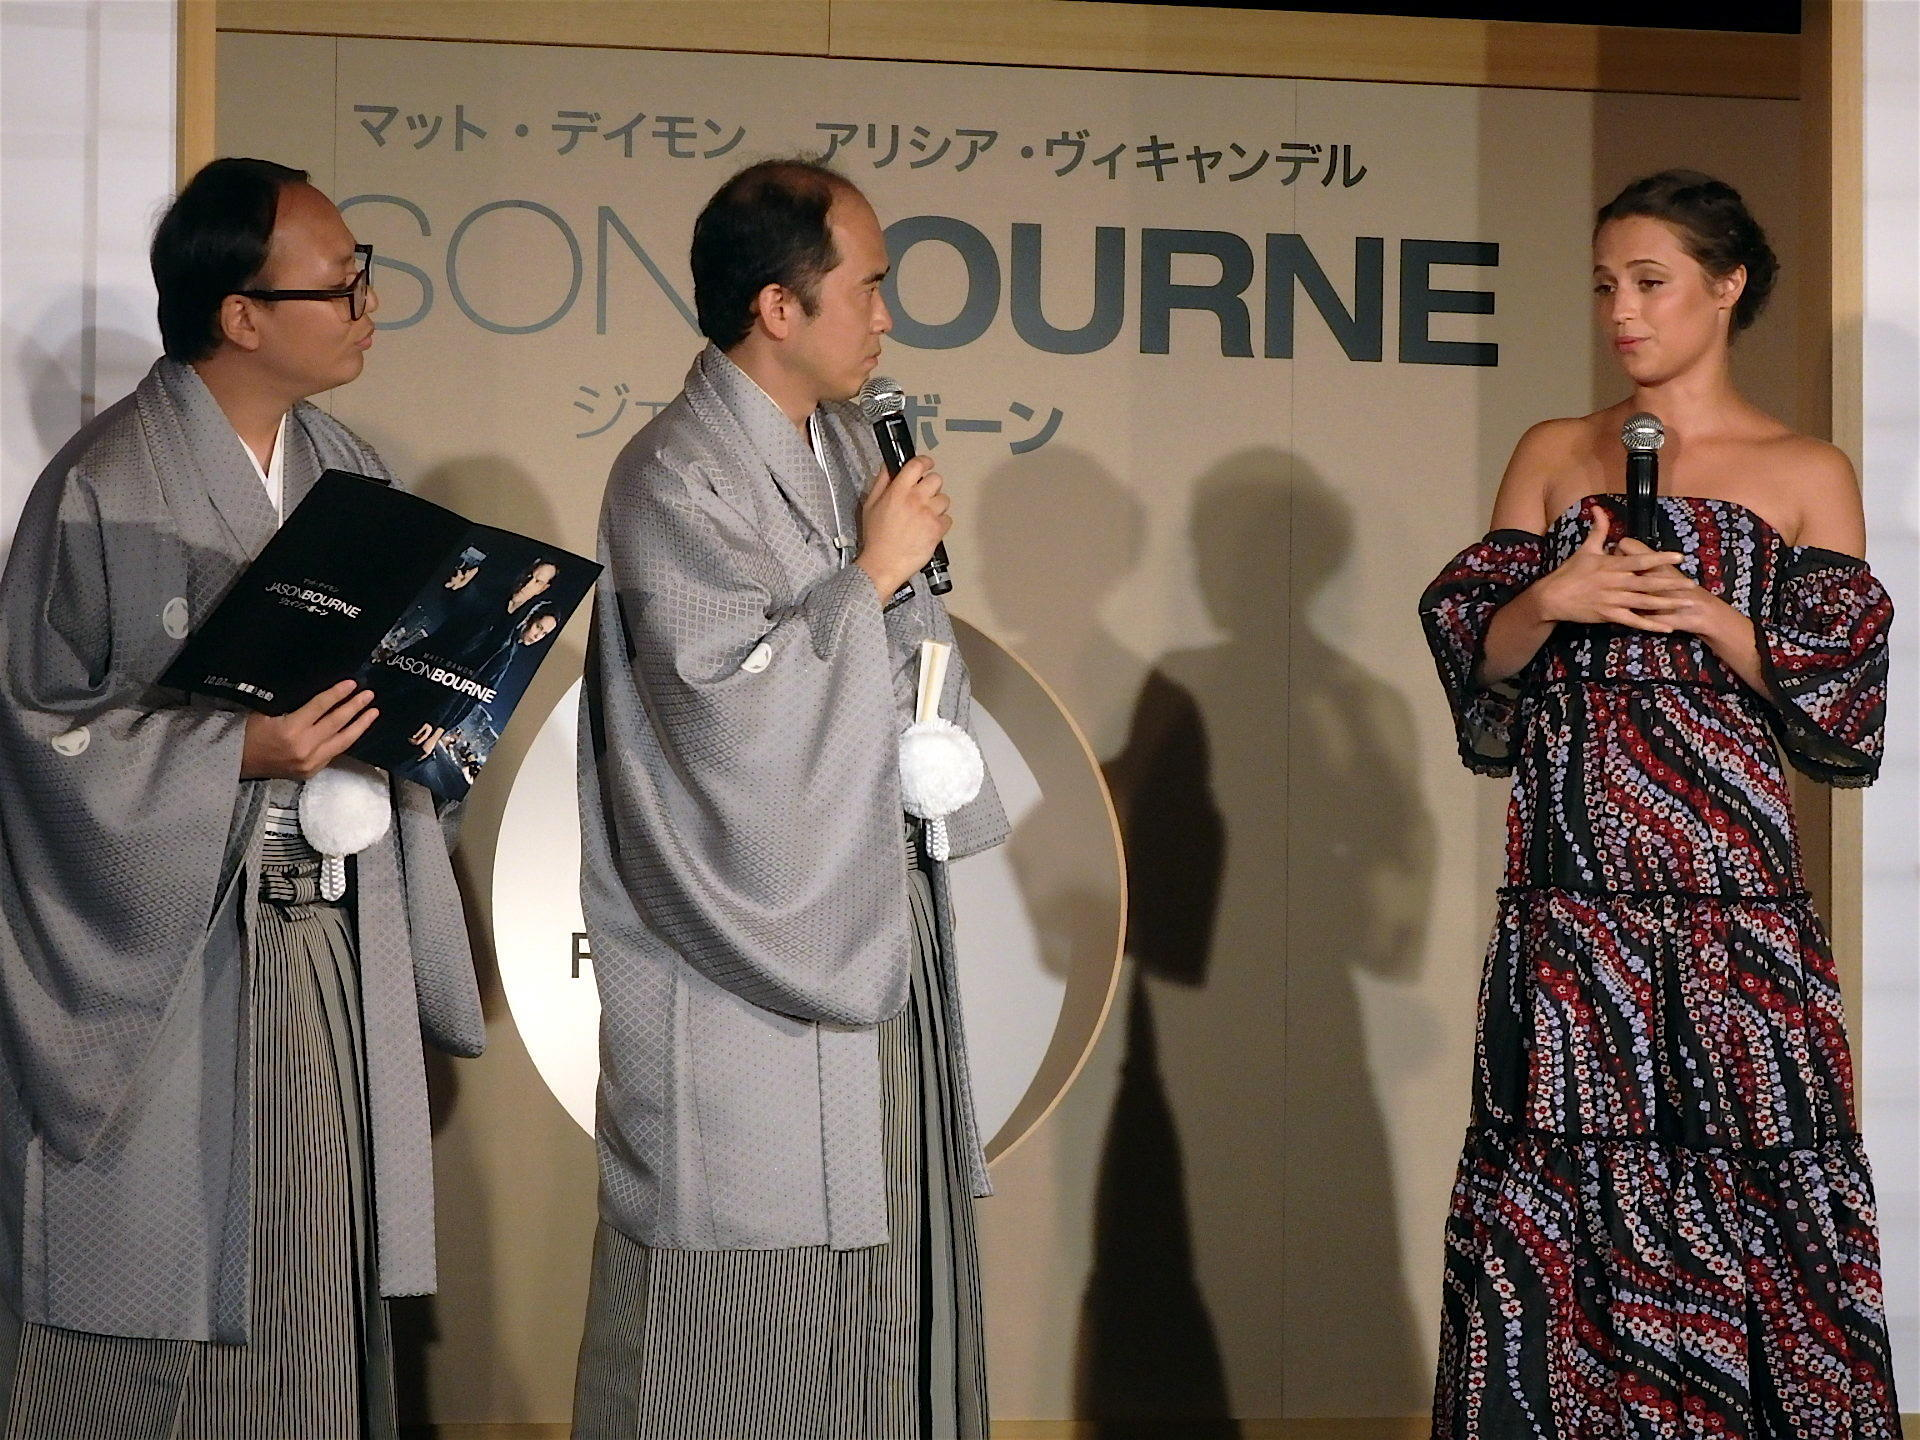 http://news.yoshimoto.co.jp/20160929230537-fd755896d8c6ea86c4880dda3aa0e07d3e537002.jpg